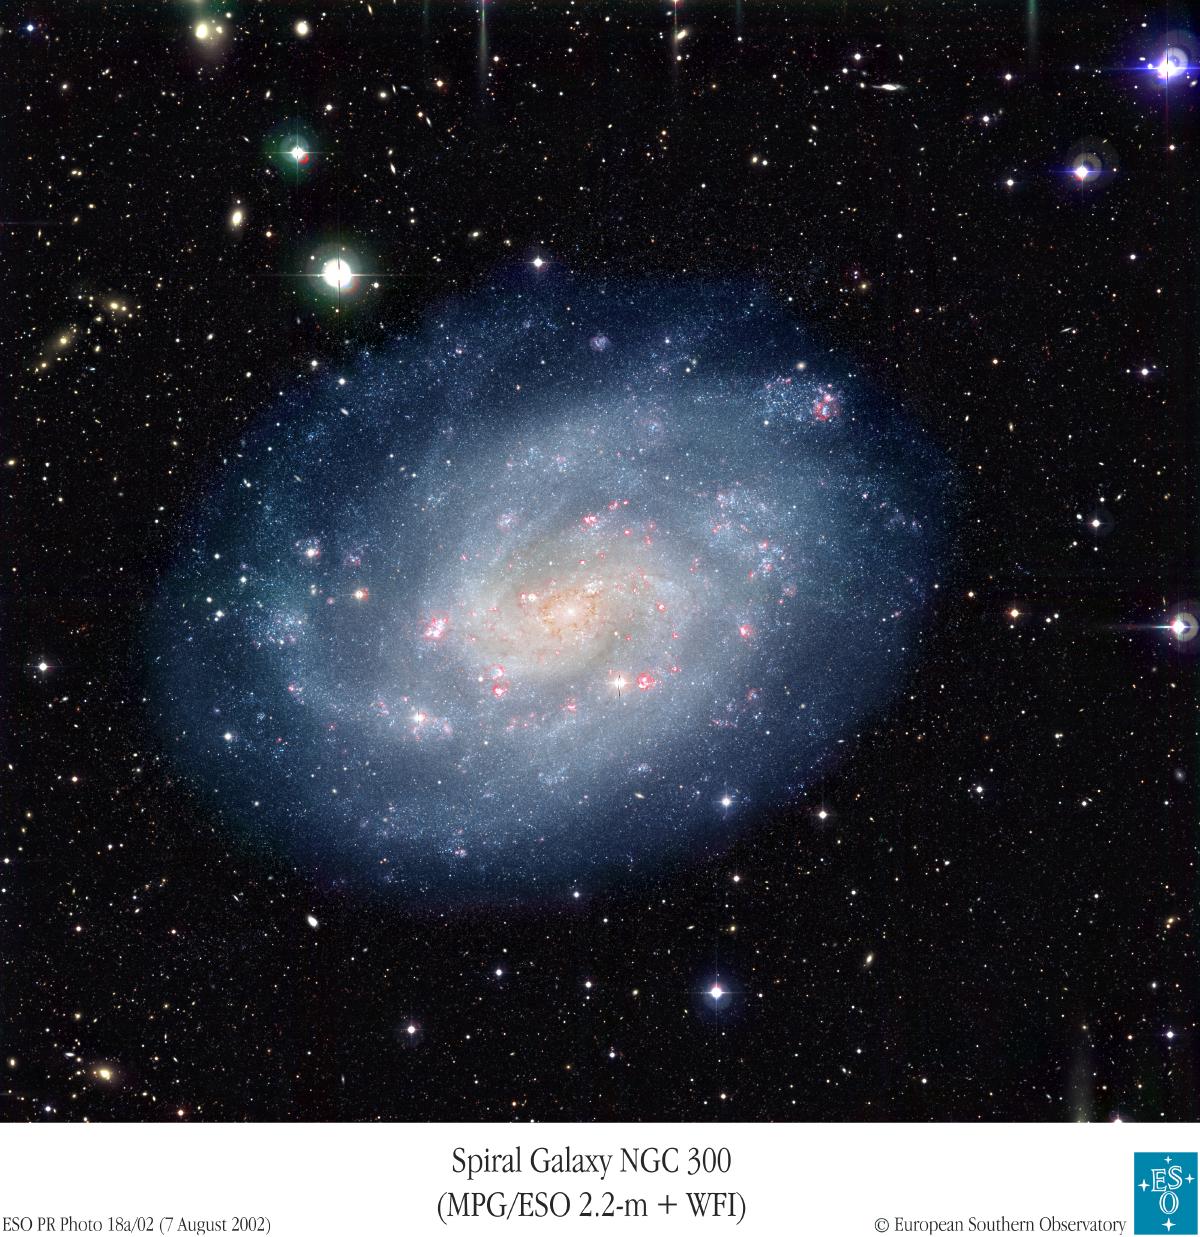 La galaxie spirale NGC300